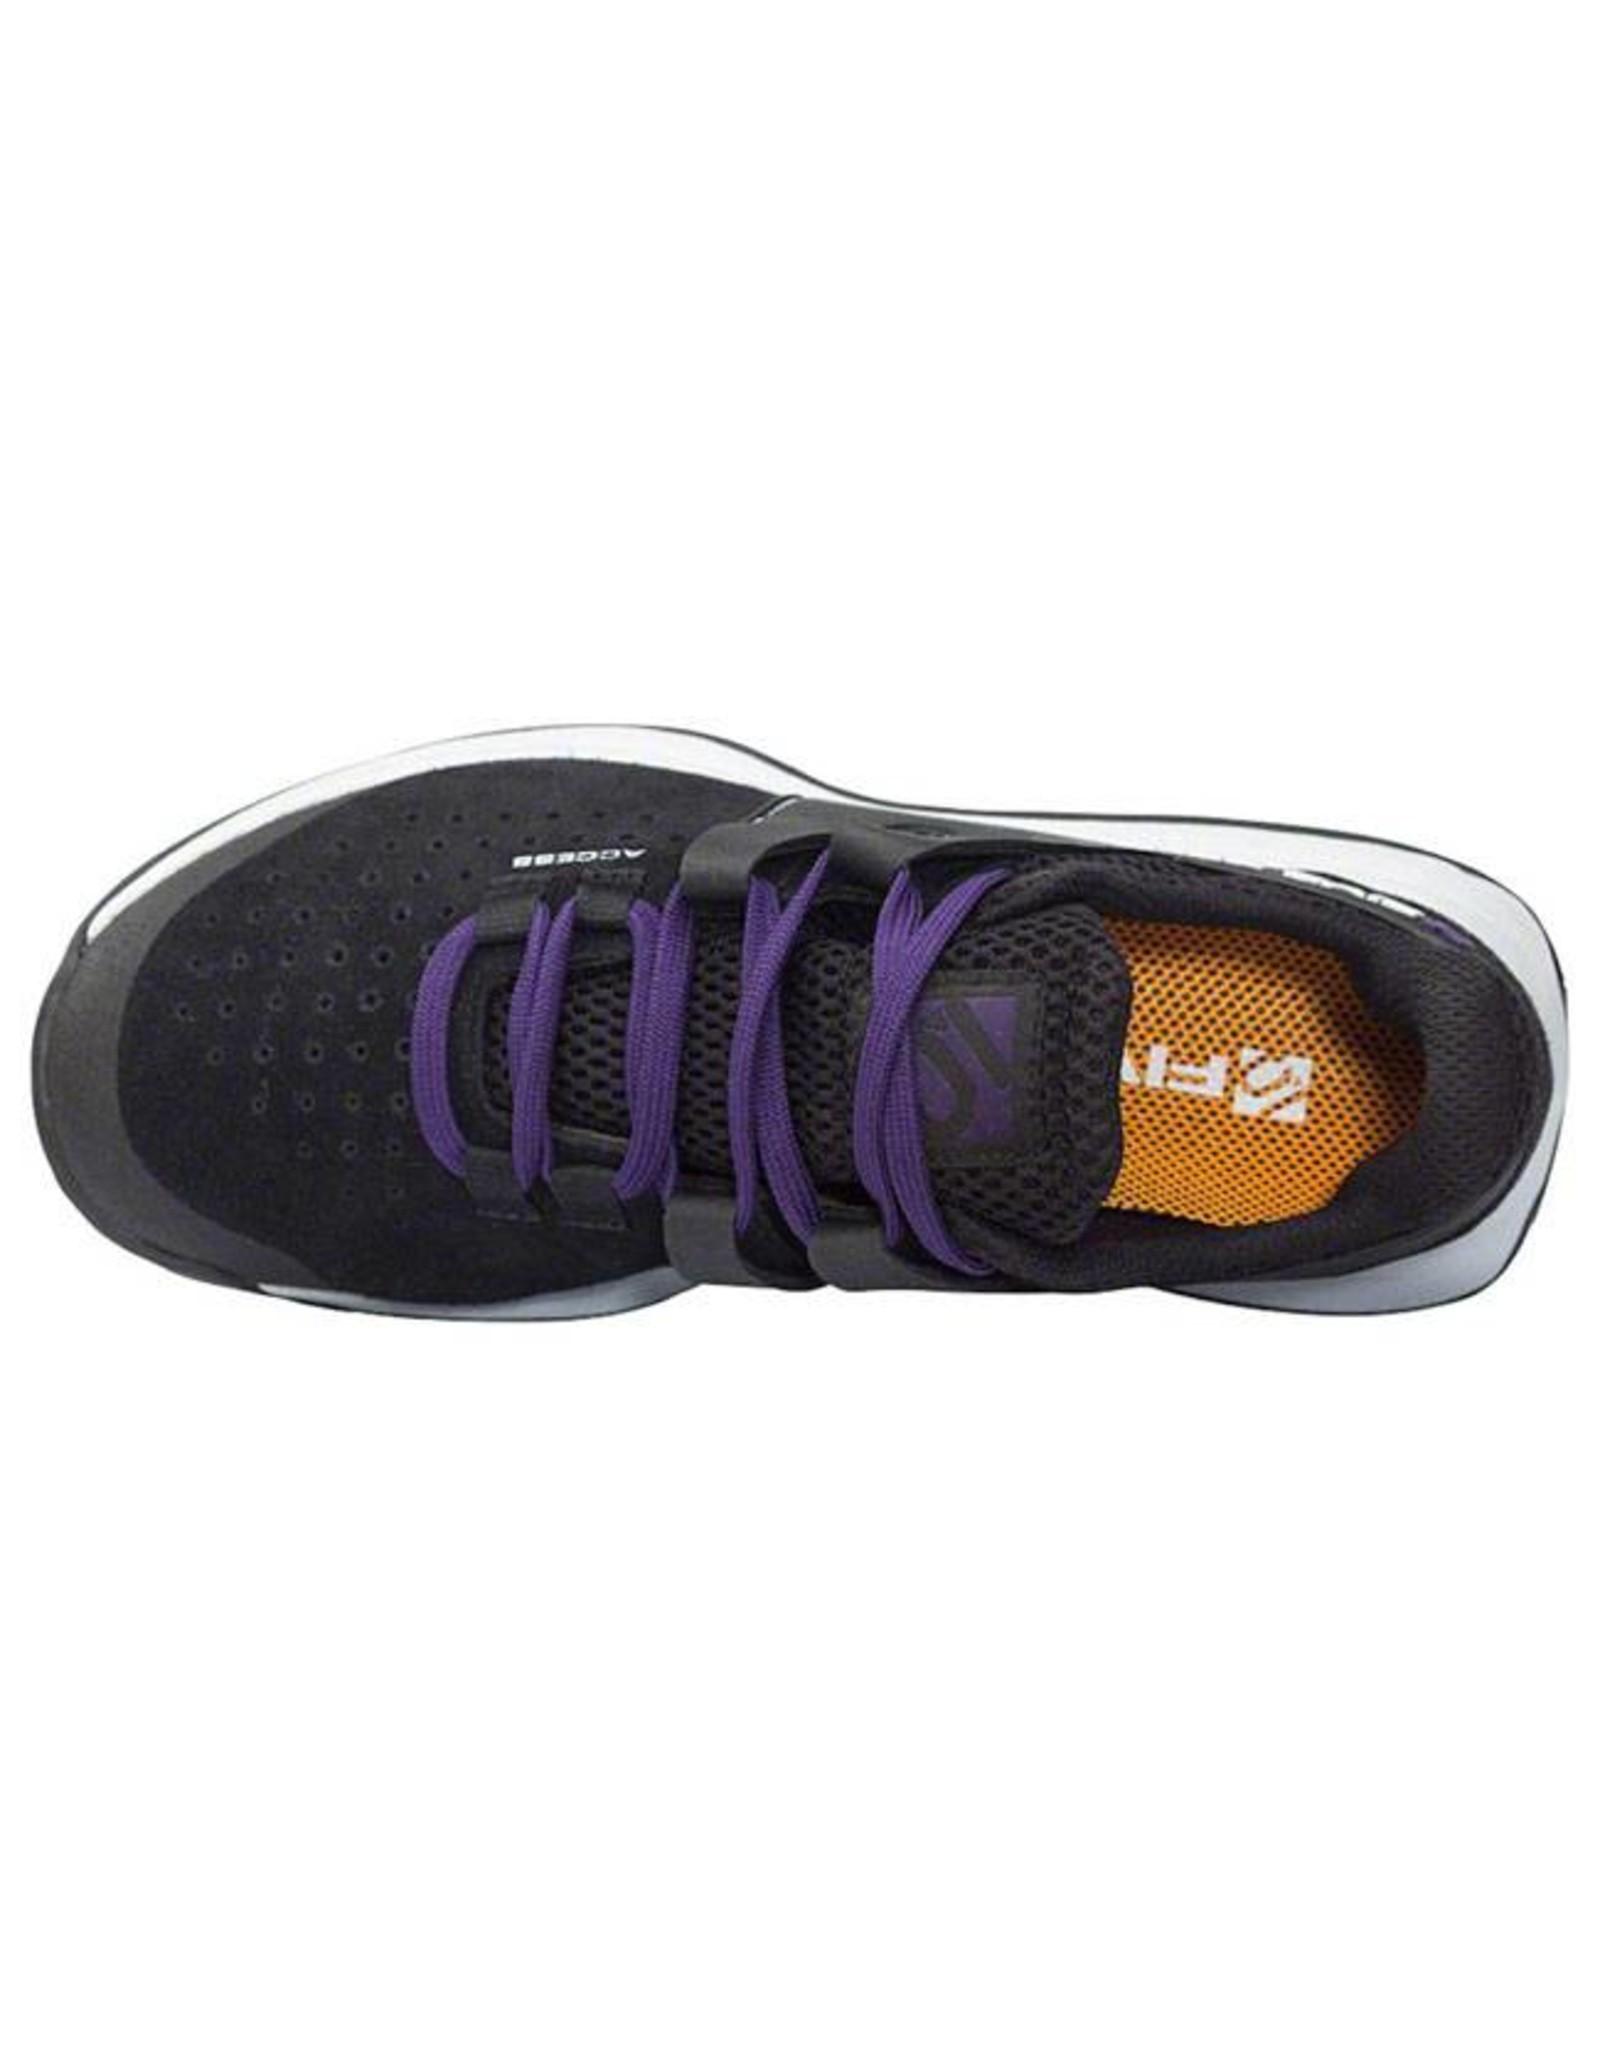 Five Ten Five Ten Access Women's Approach Shoe: Gray 6